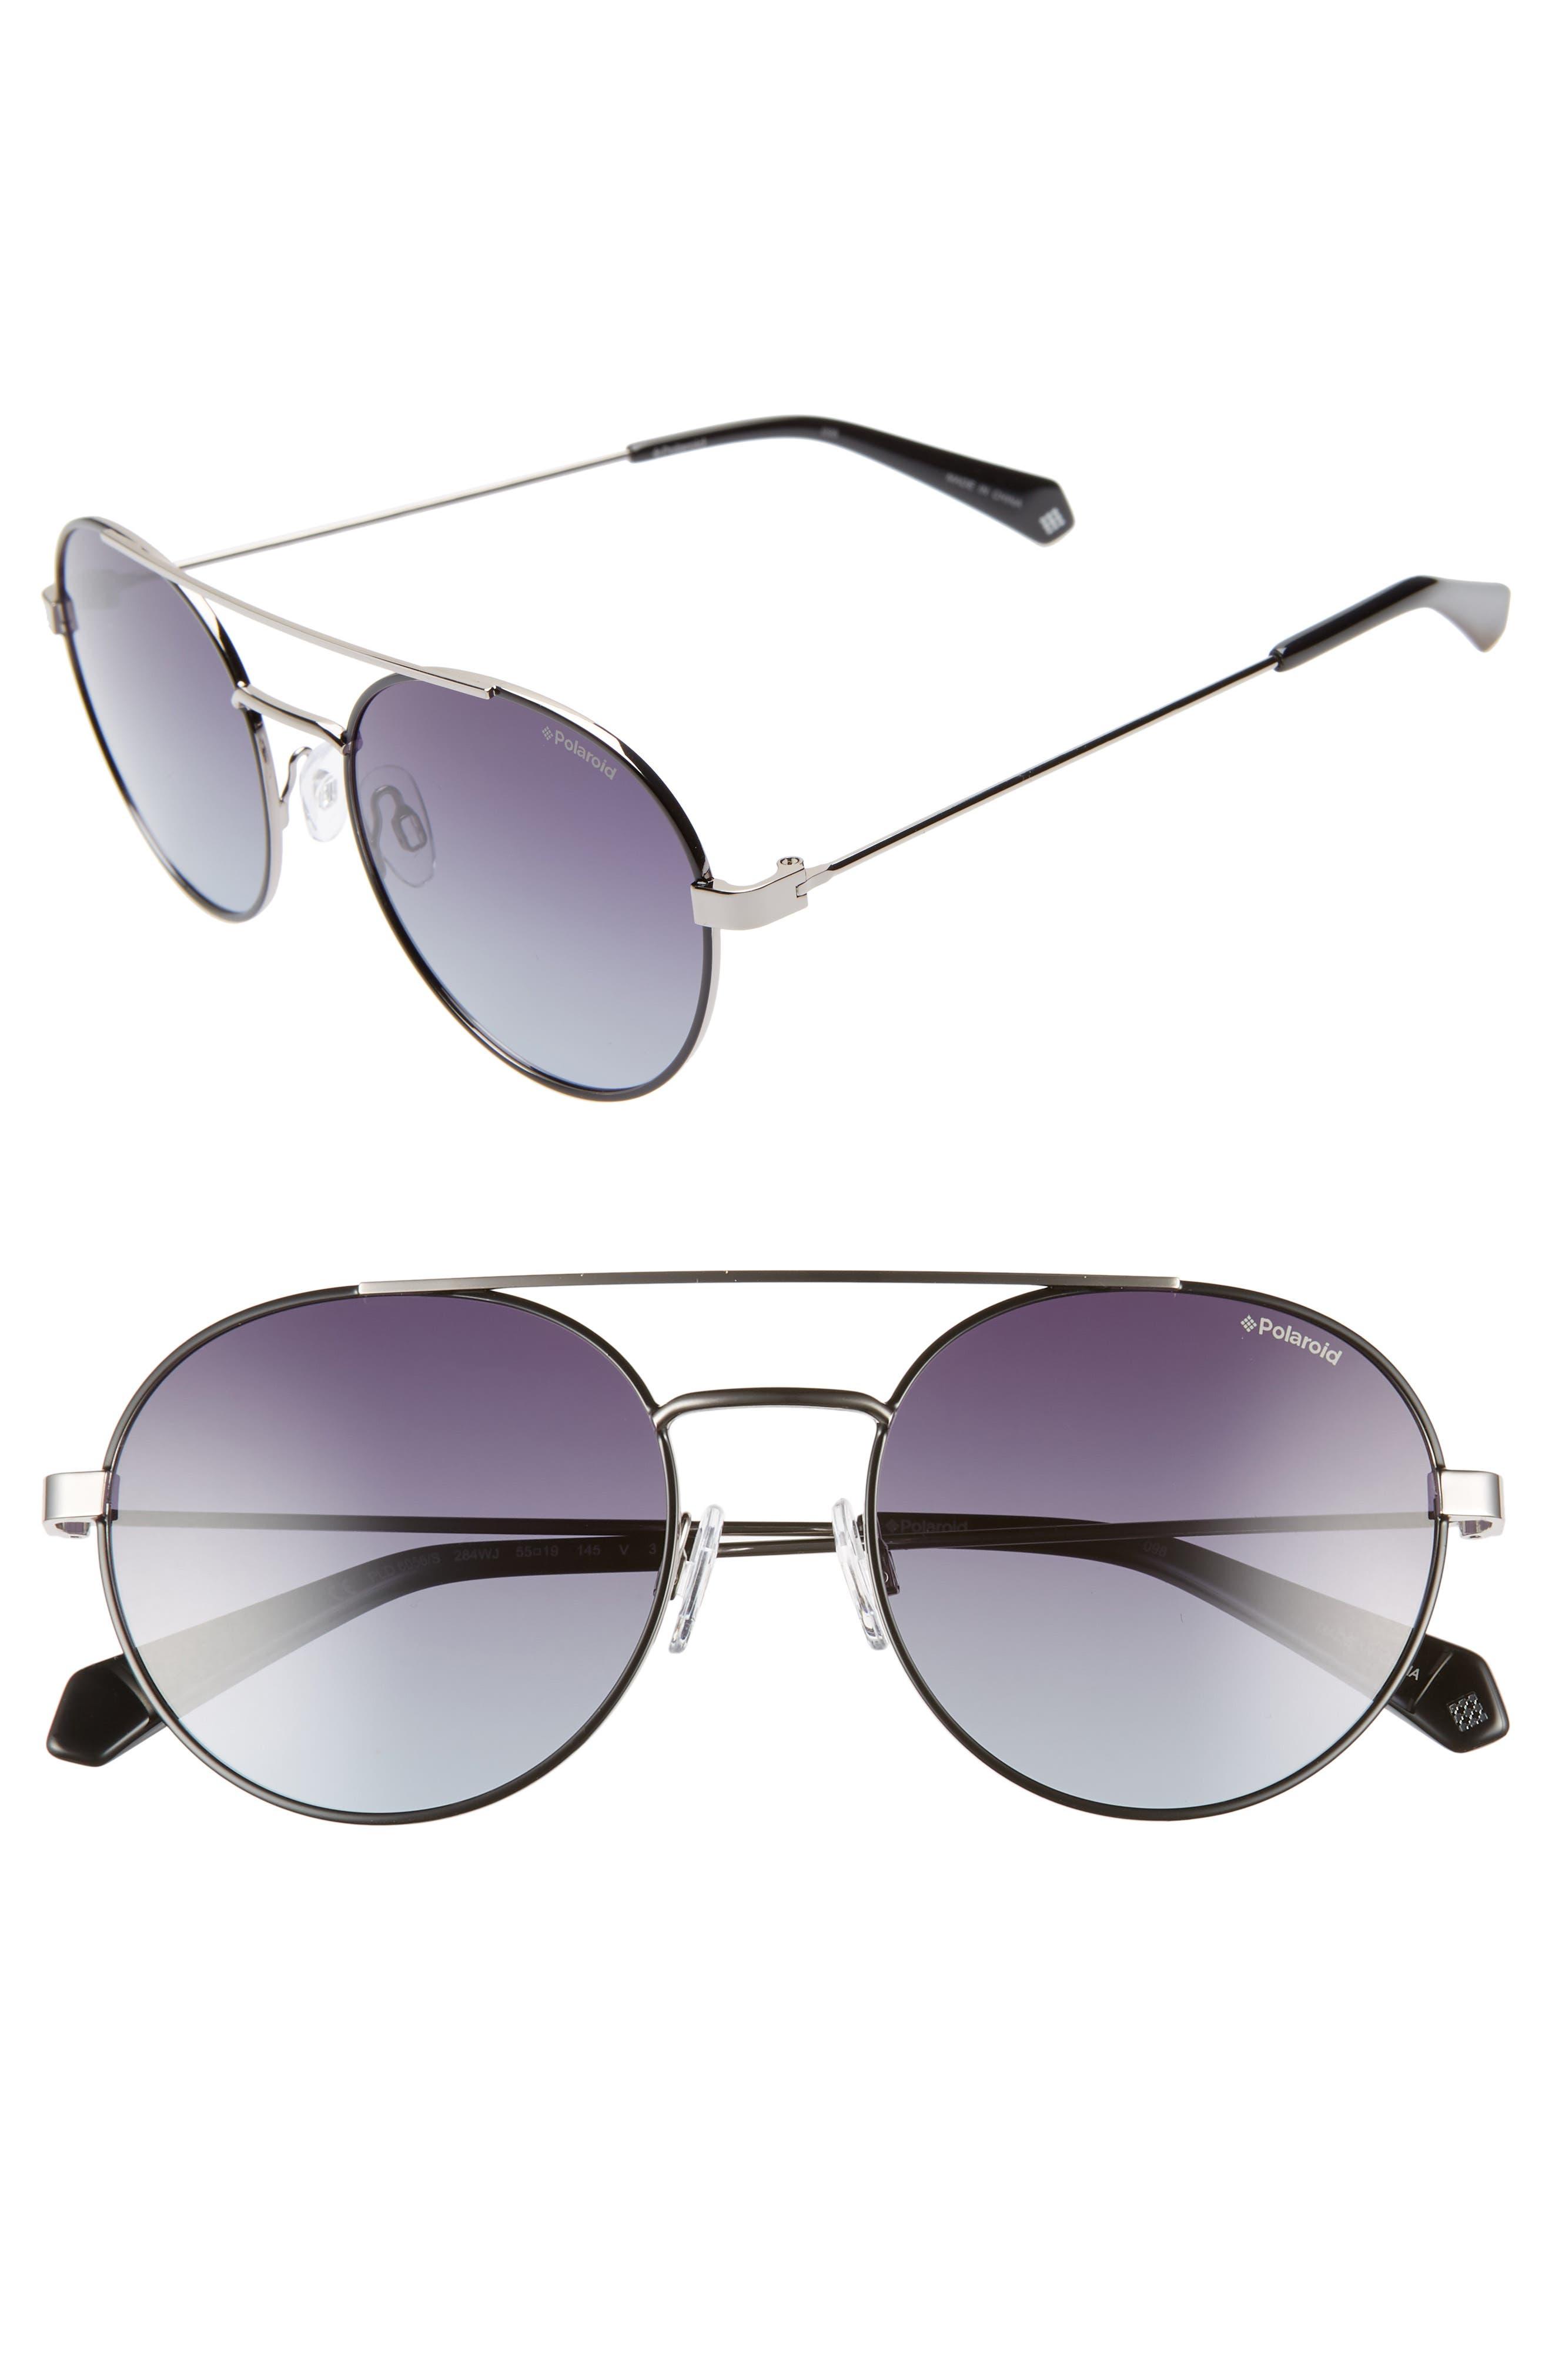 Round 55mm Polarized Sunglasses,                             Main thumbnail 1, color,                             BLACK